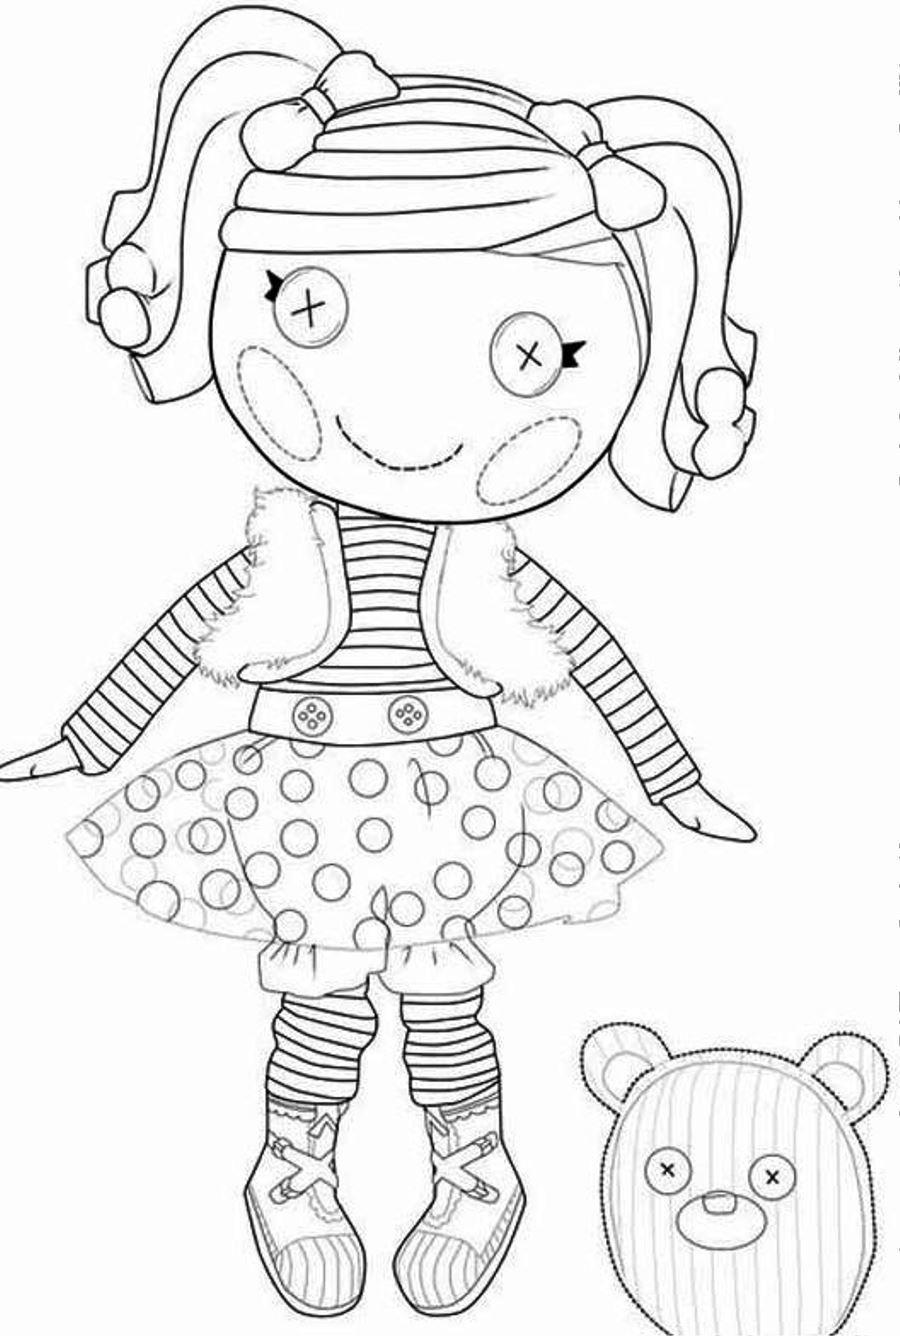 Lalaloopsy Free Printable Coloring Pages No 1 Coloringplus Com Lalaloopsy Coloring For Kids Printables Kids